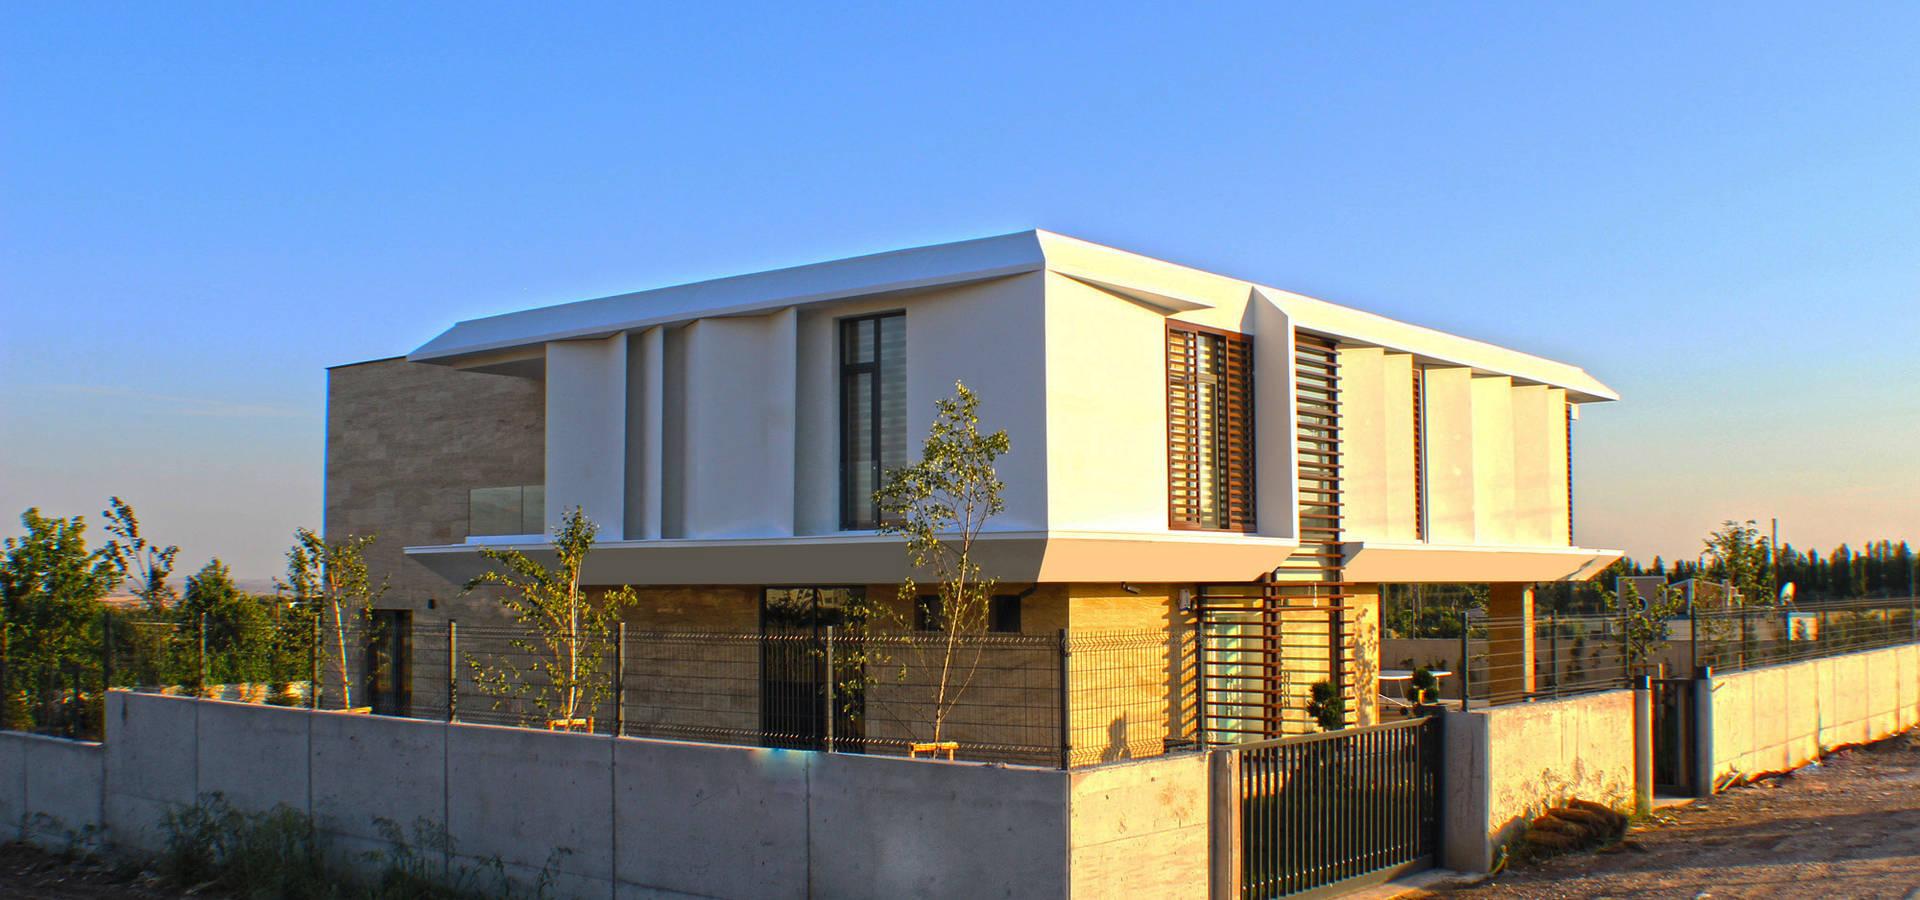 Ayzen Dizayn Mimarlık